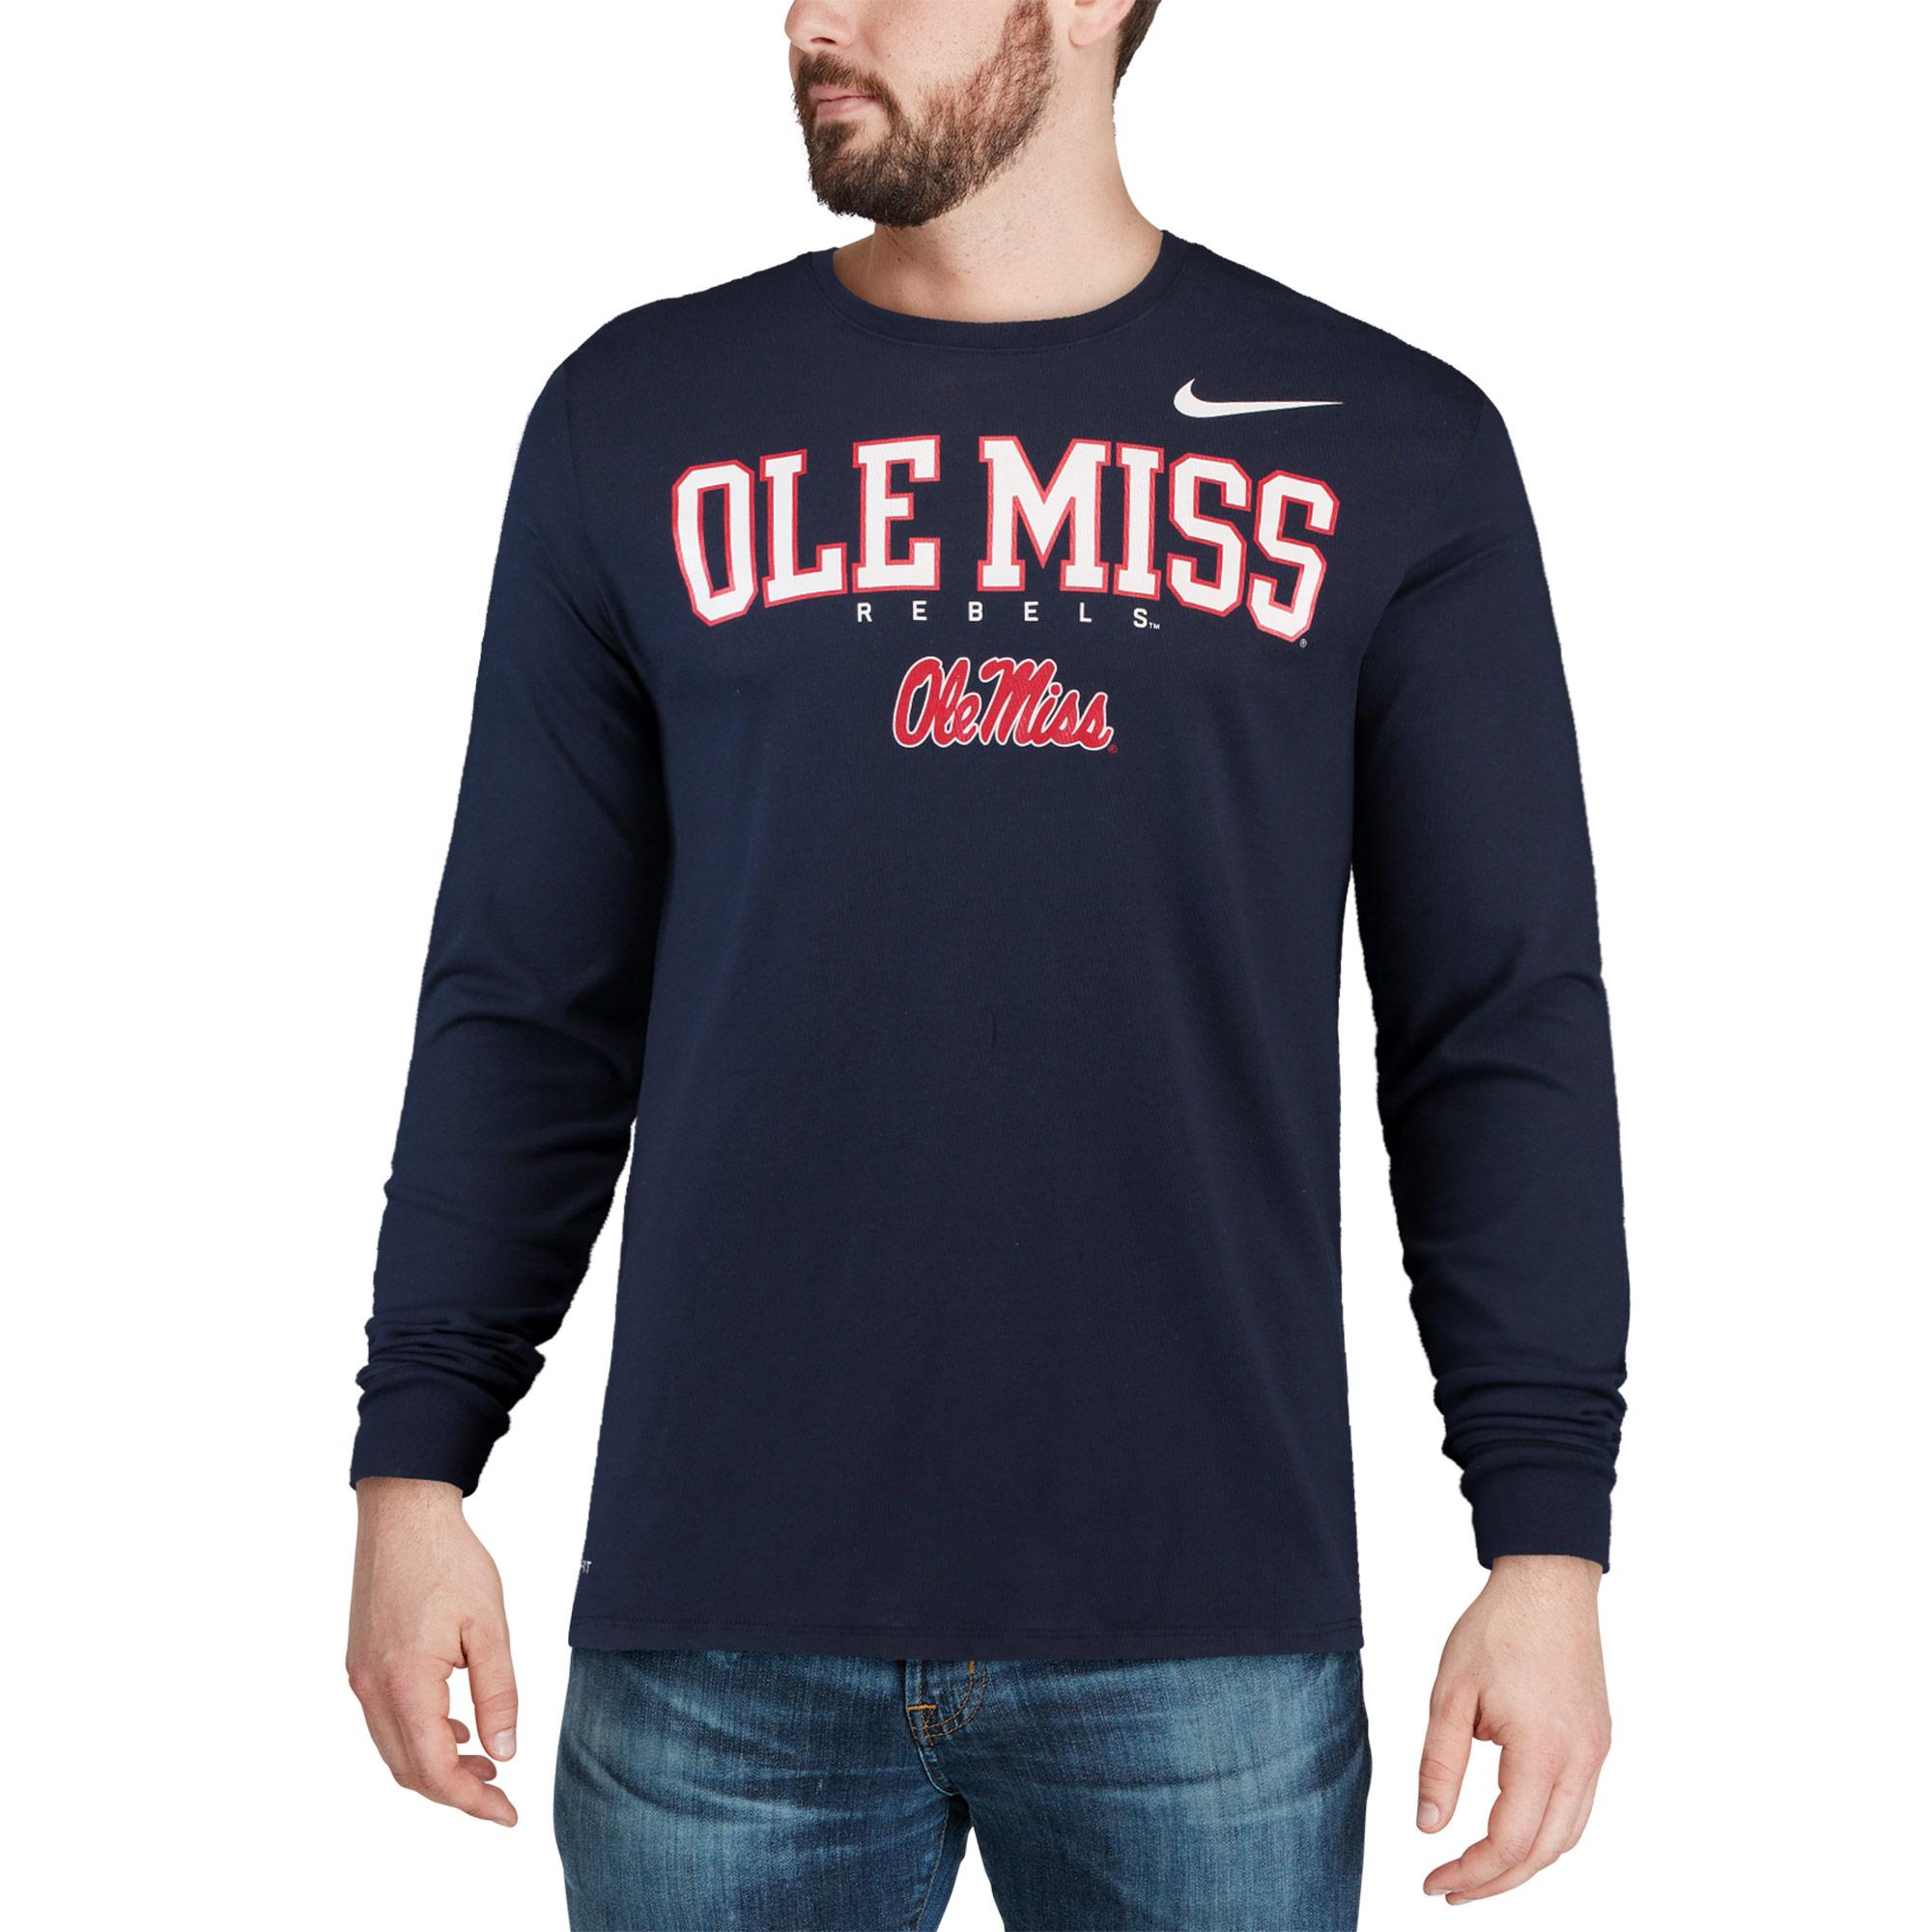 cf0b62456 Ole Miss Rebels Nike 2018 Facility Dri-FIT Cotton Long Sleeve T-Shirt -  Navy - Walmart.com